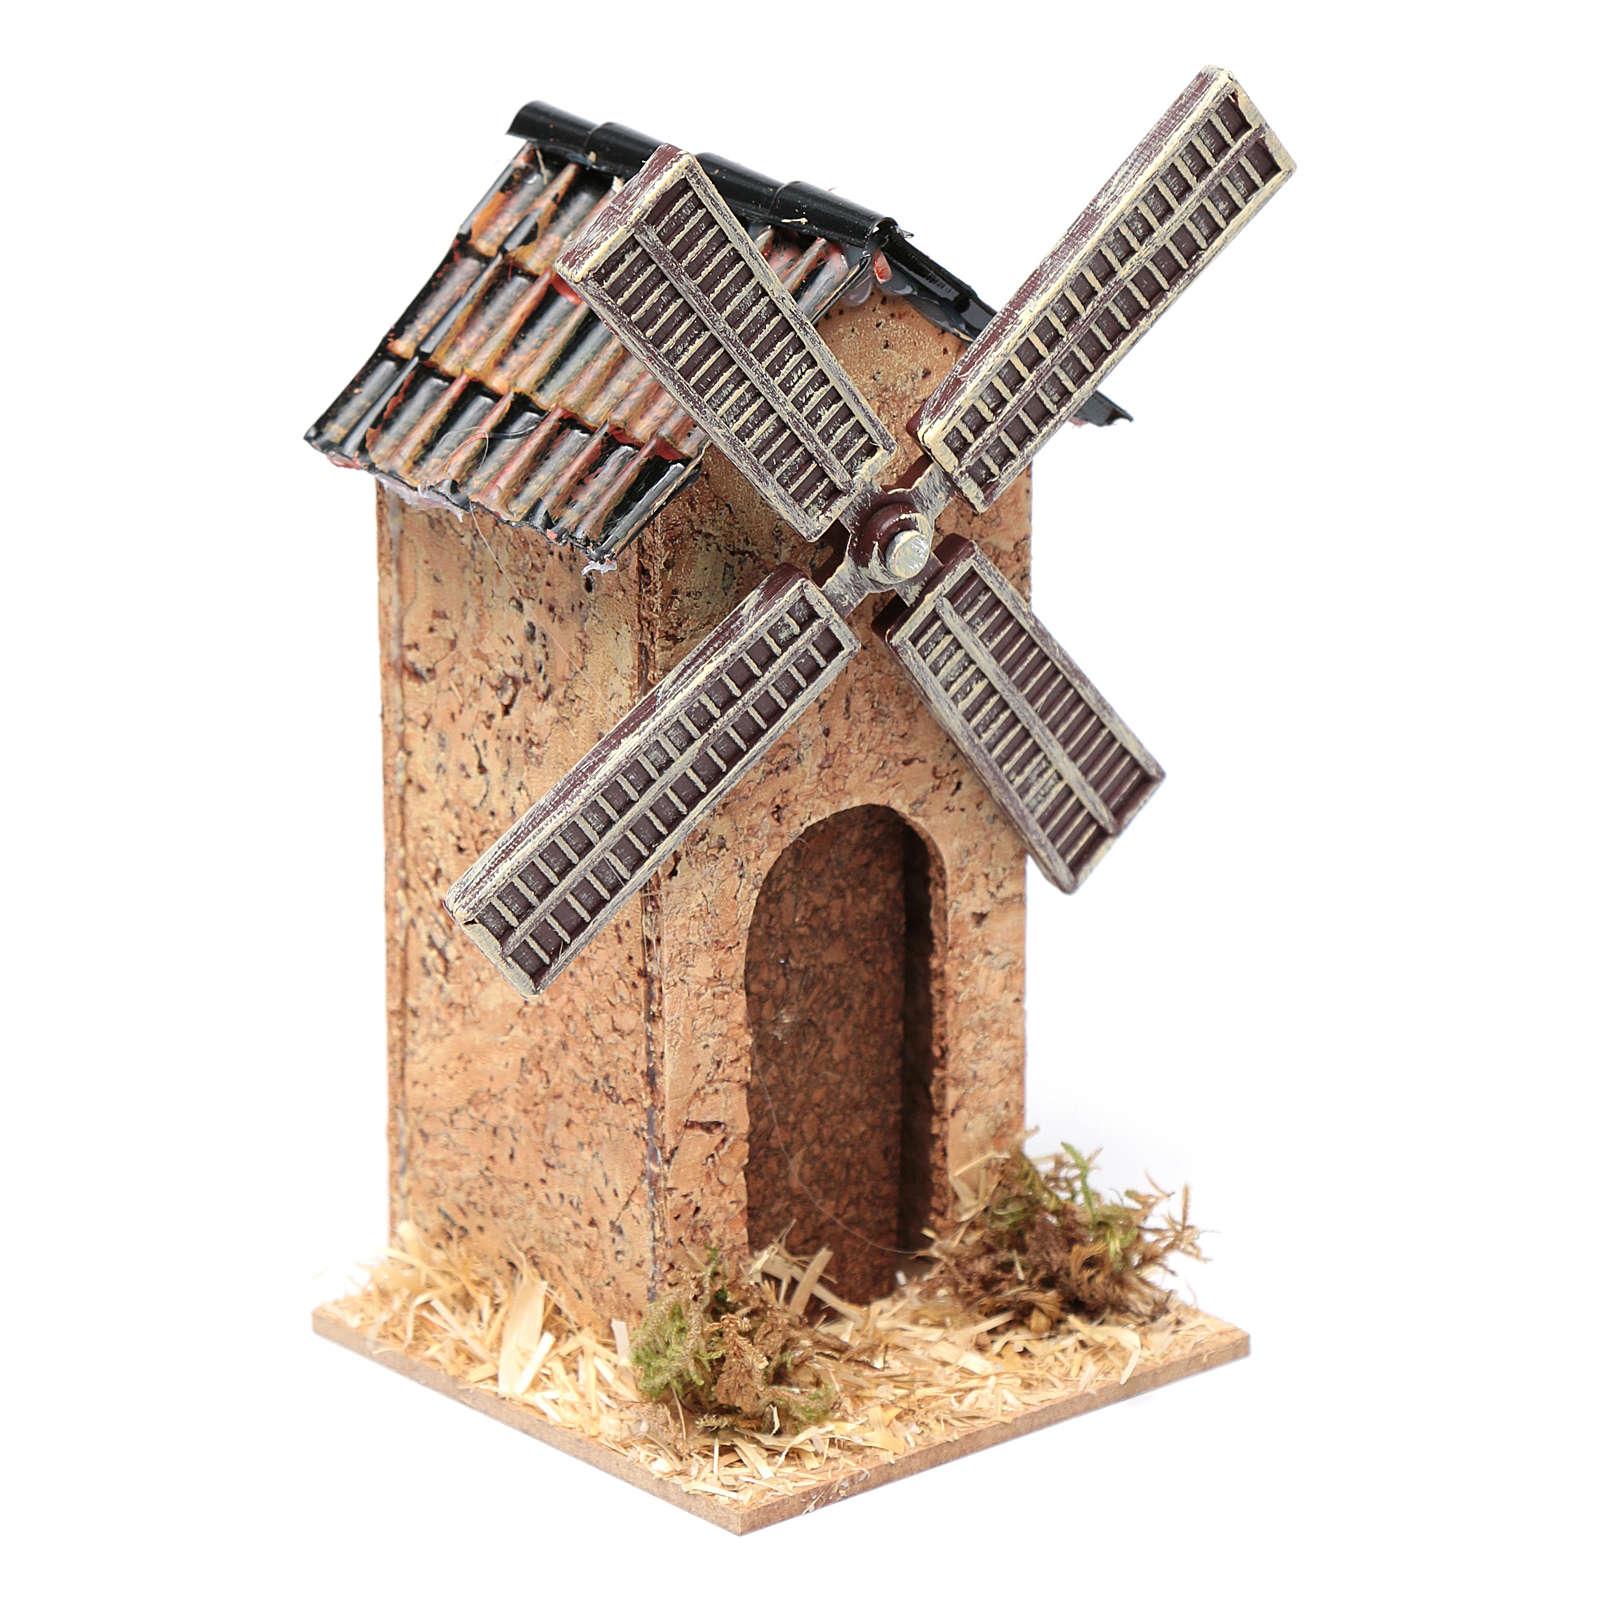 Nativity scene windmill in cork 10x5x5 cm 4